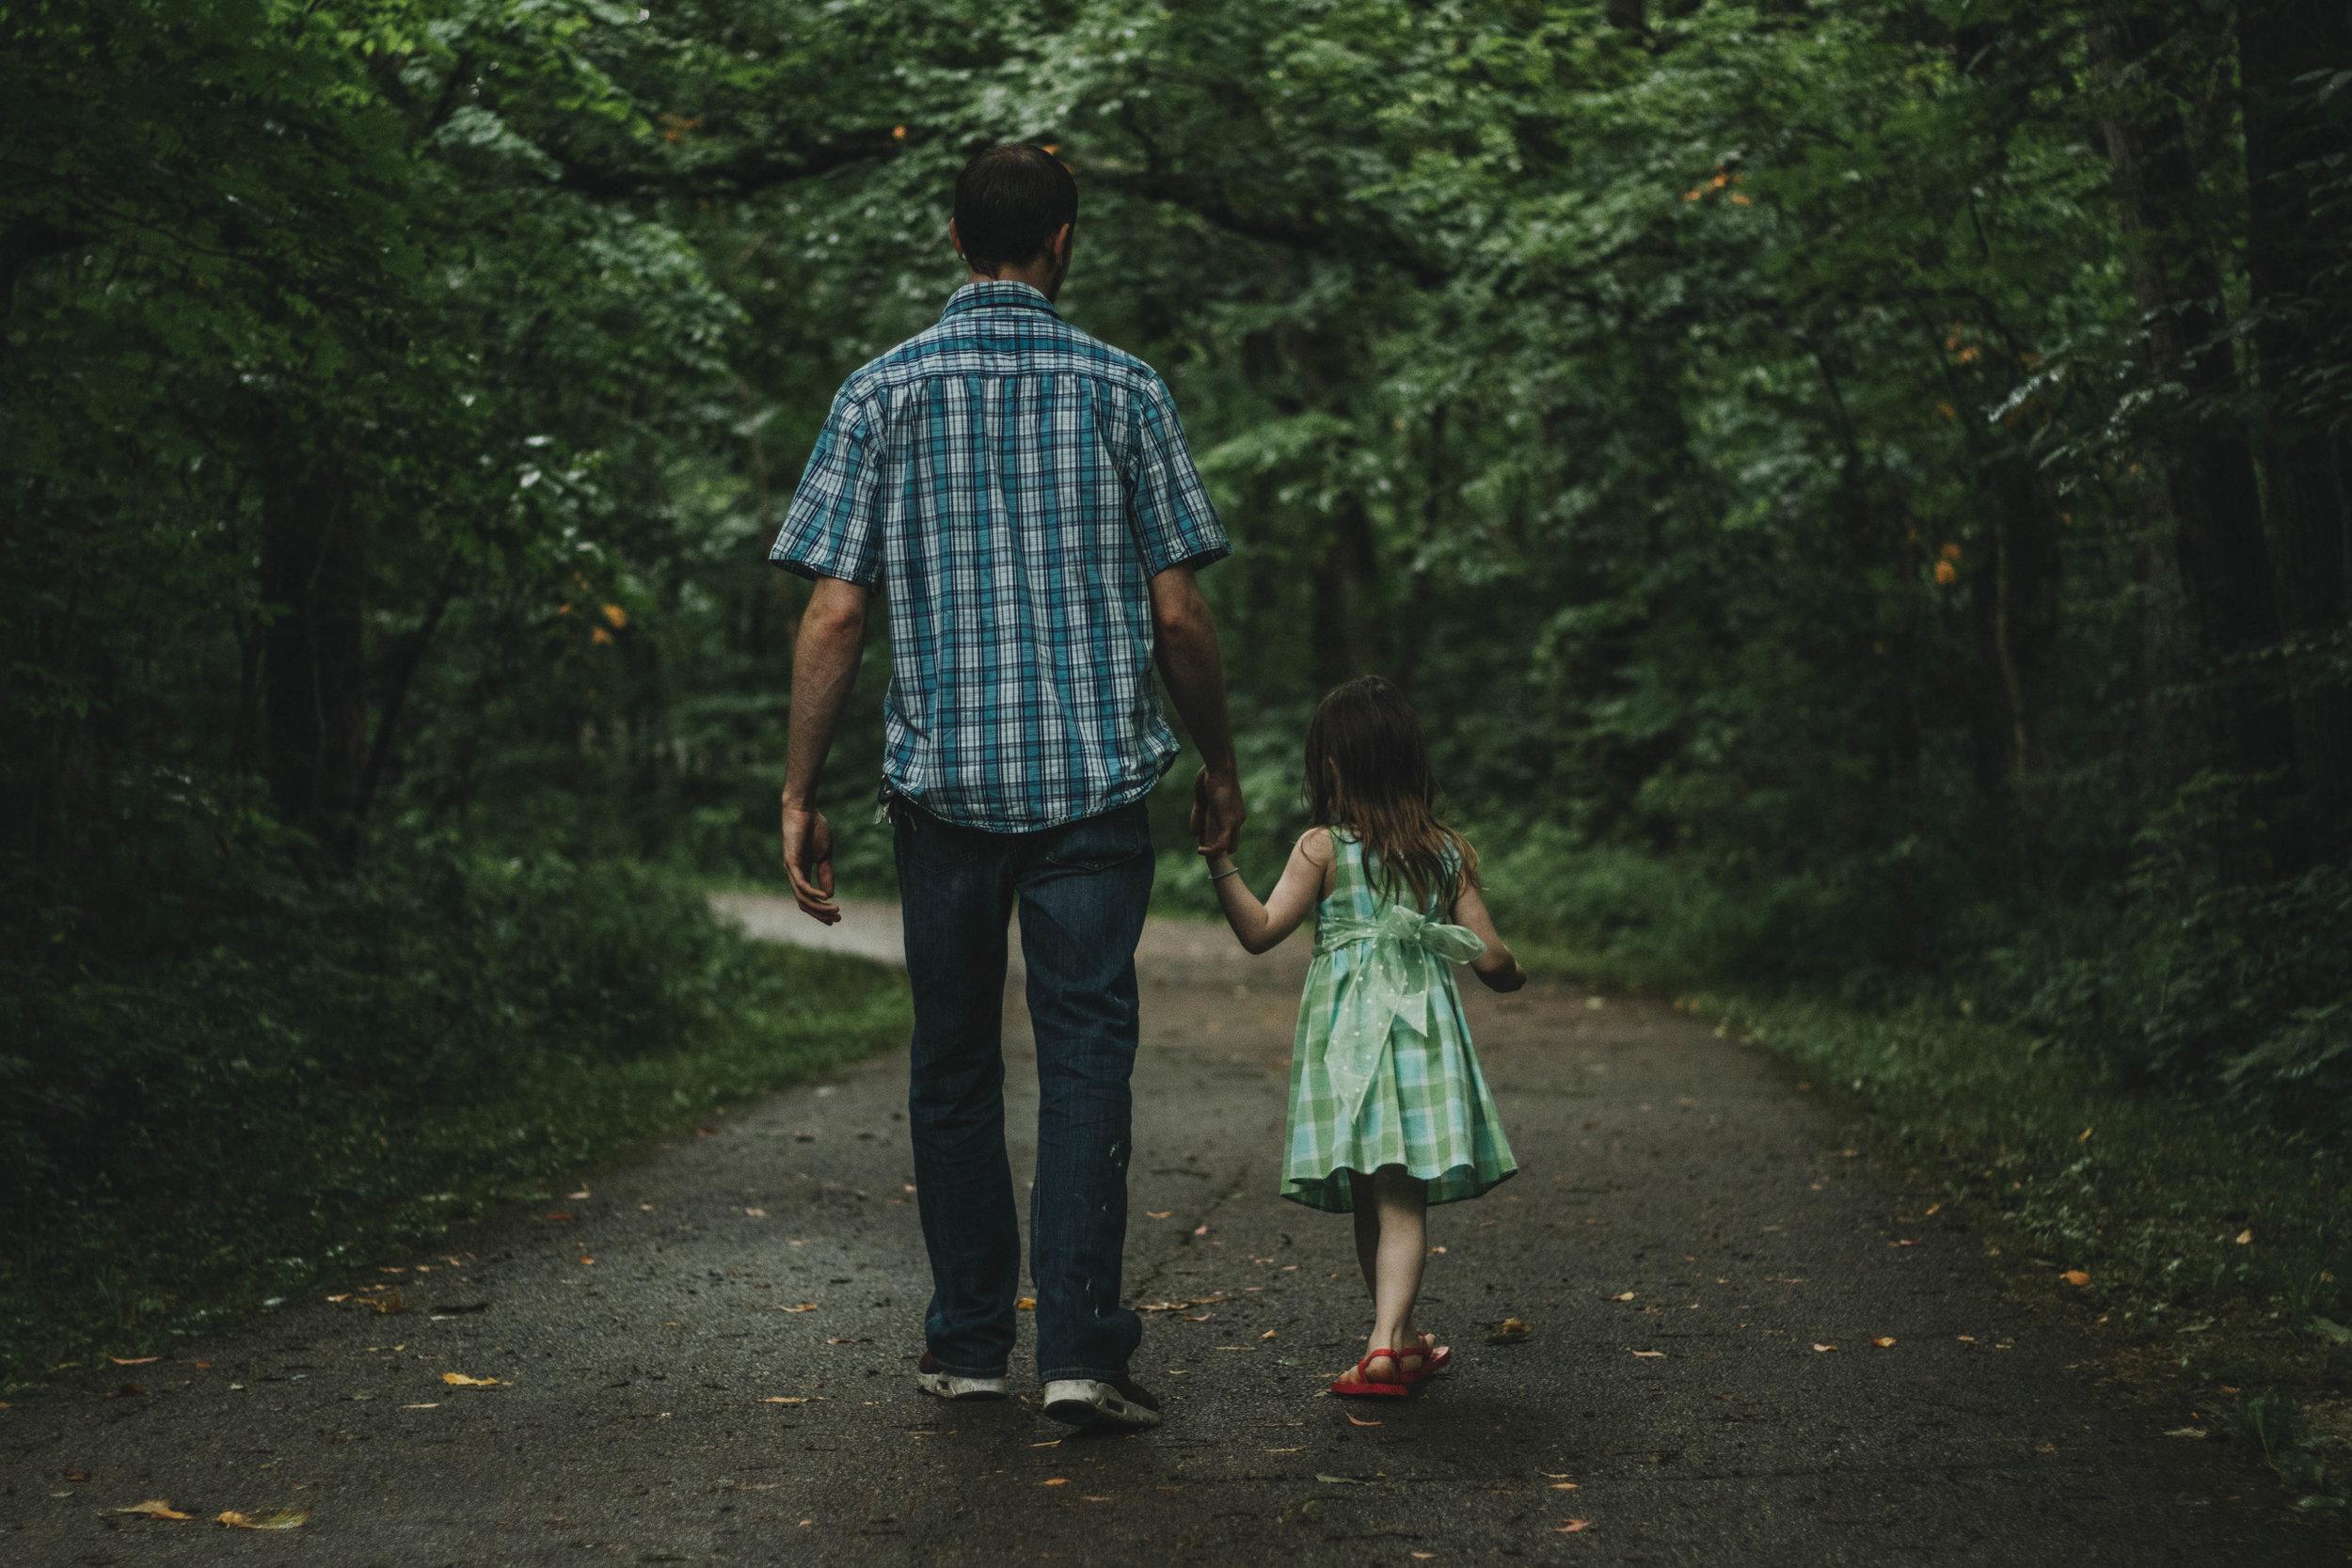 Daddy & Me Portraits | Englewood, Ohio Photographer